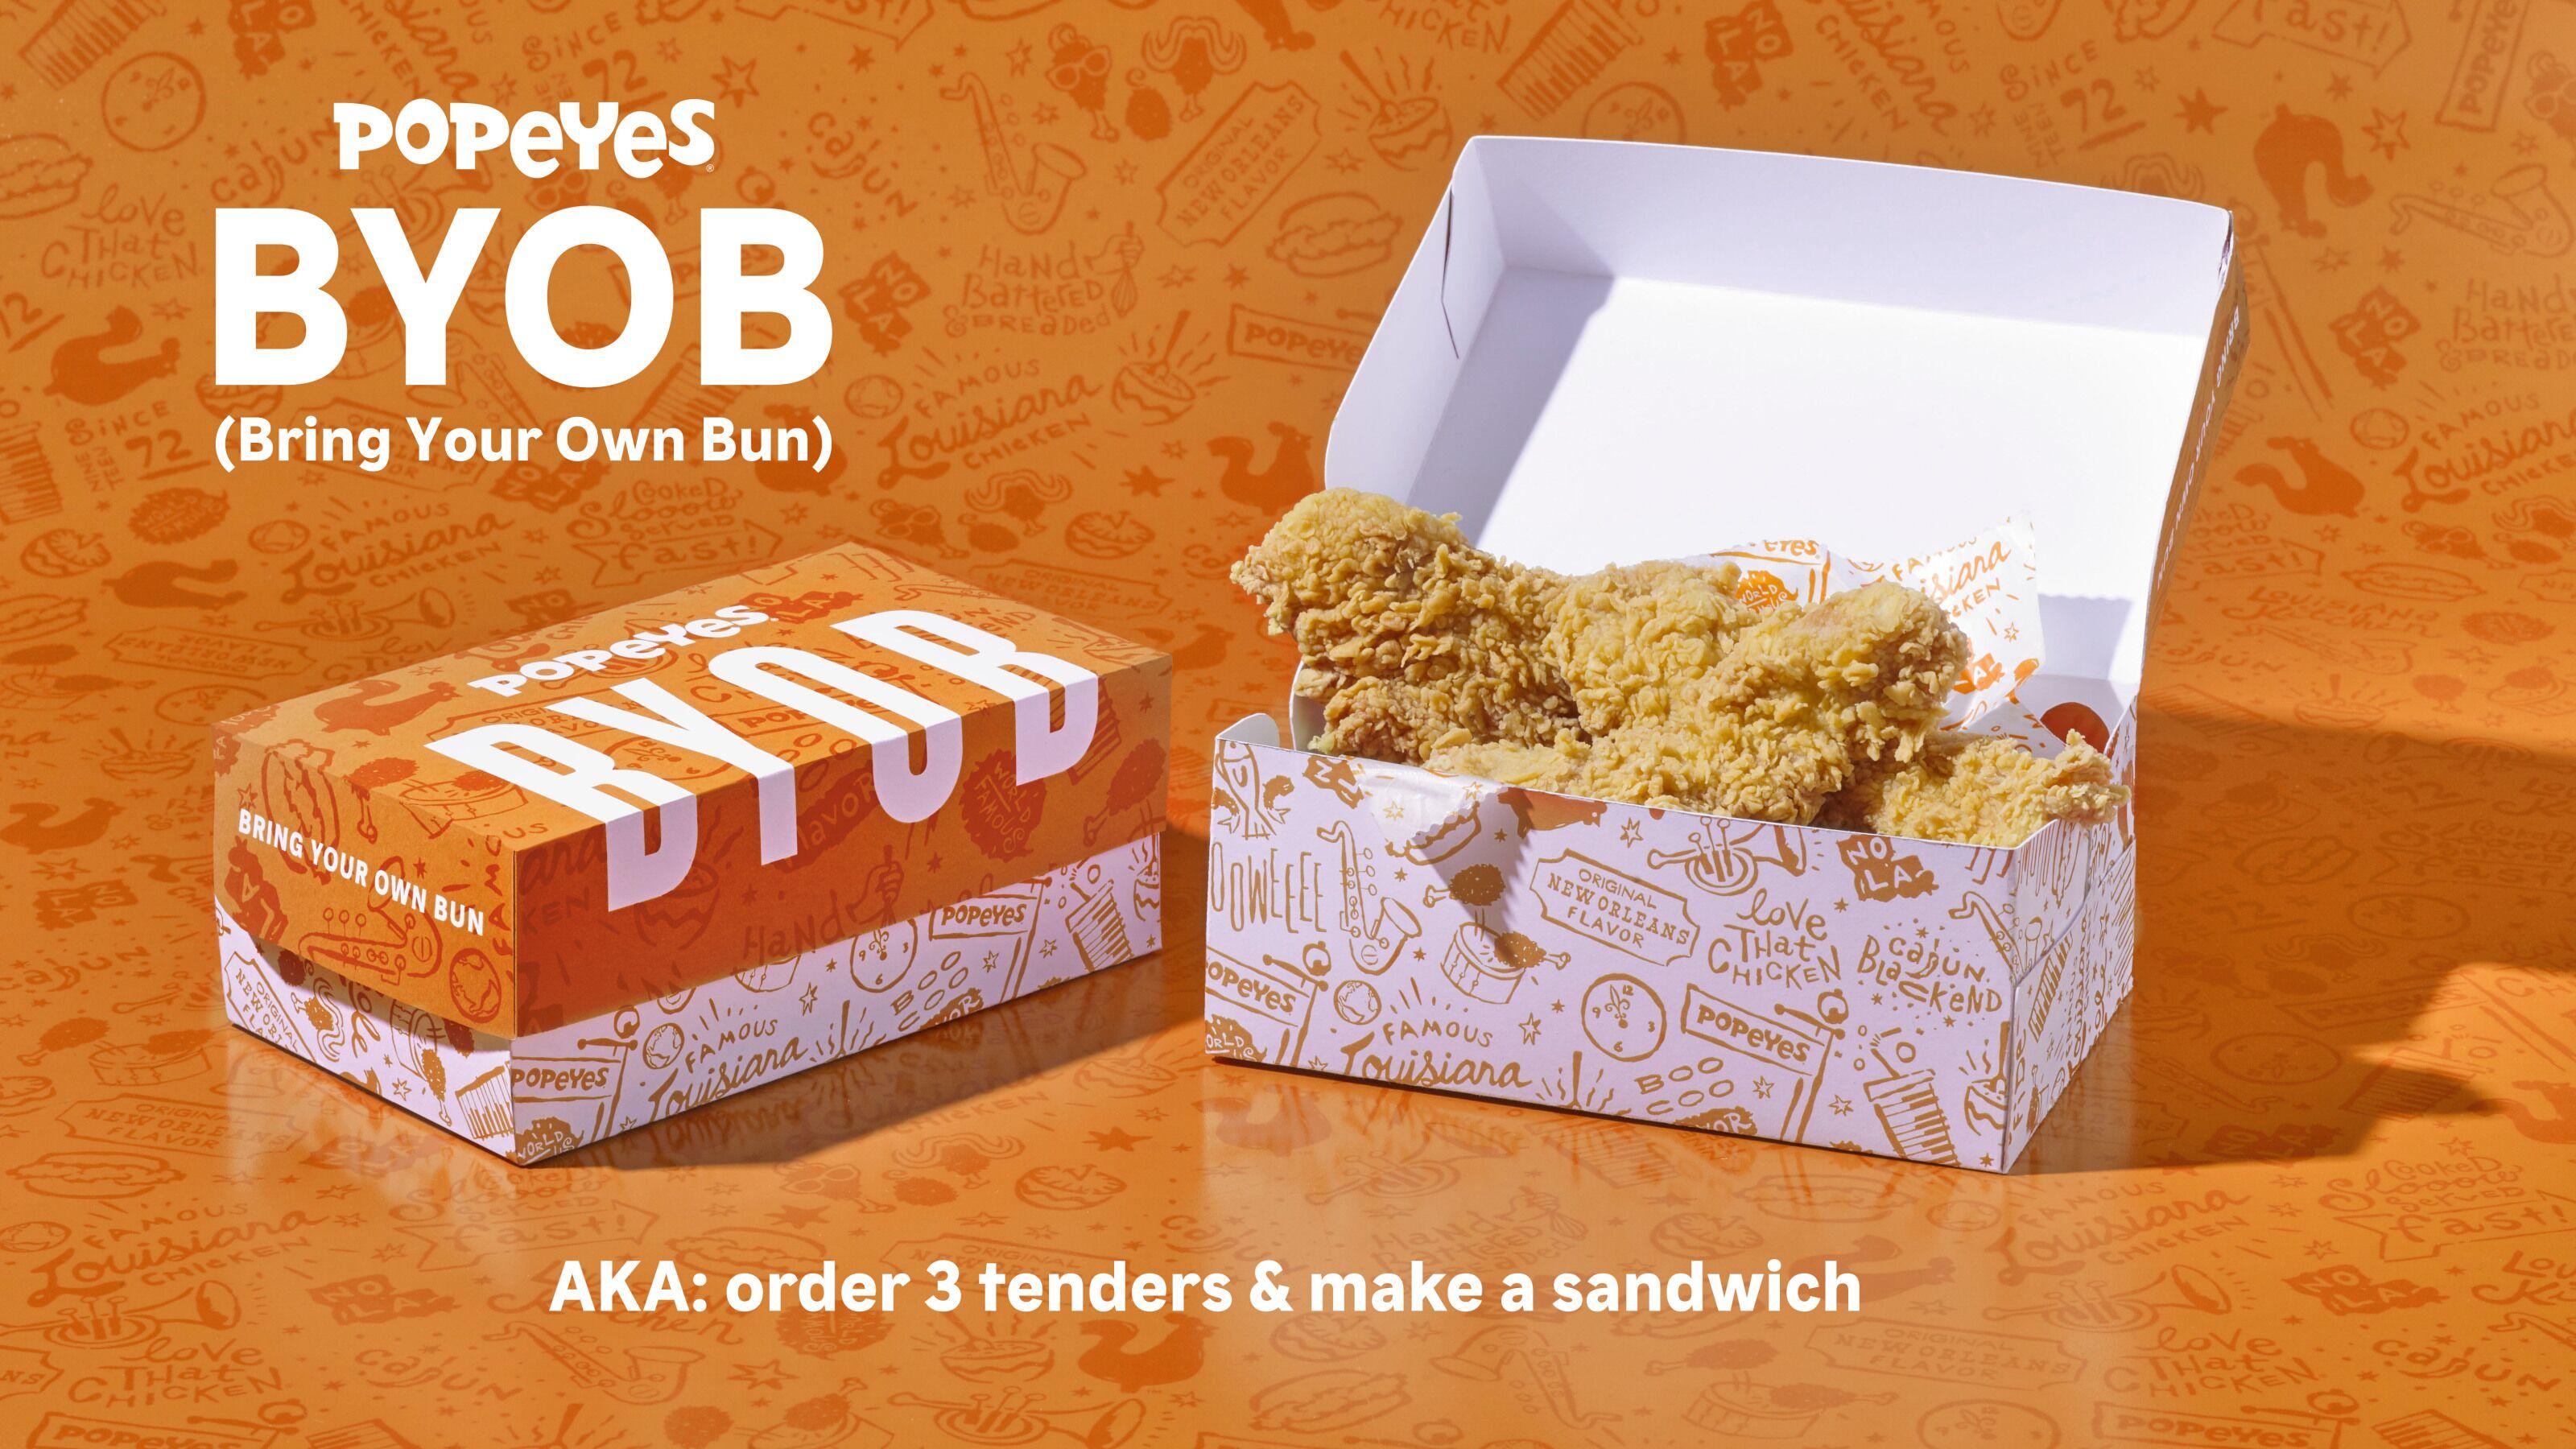 Craving a Popeyes chicken sandwich? Just bring your own bun